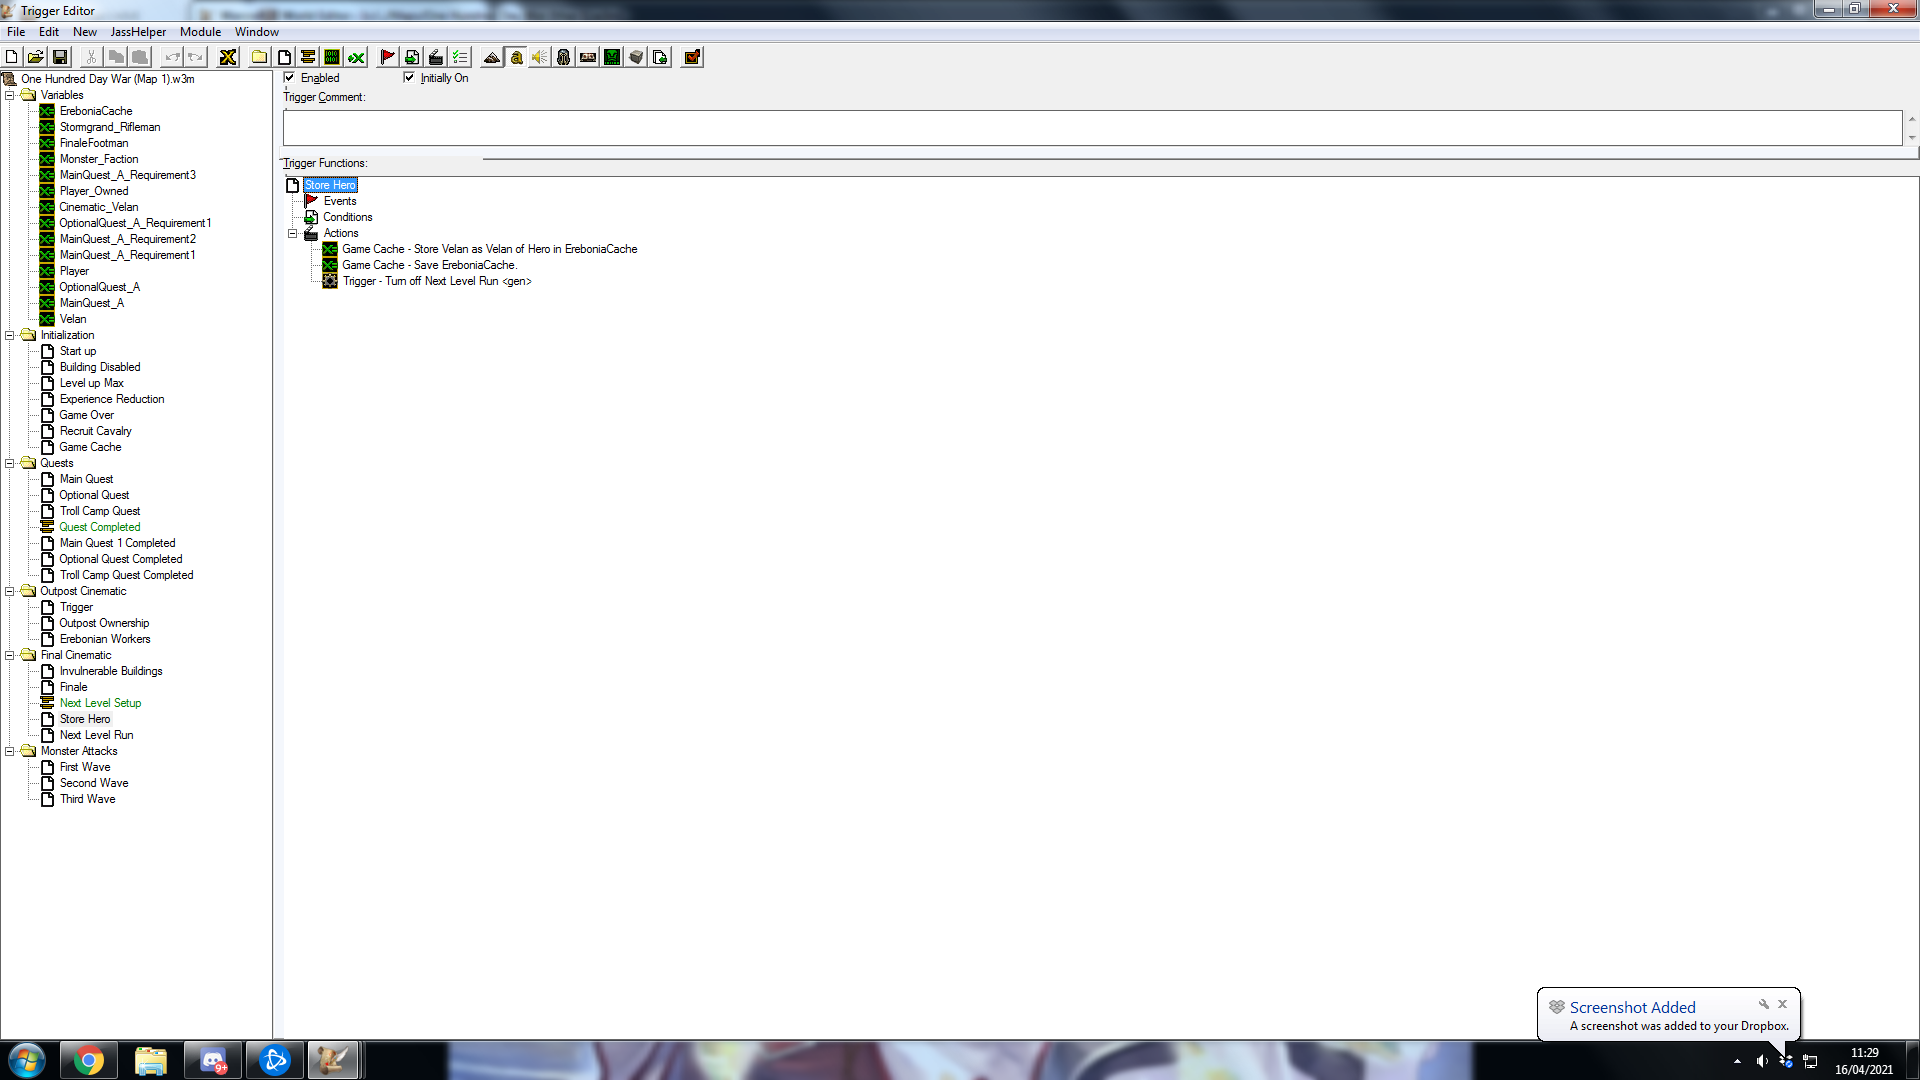 Screenshot 2021-04-16 11.29.05.png